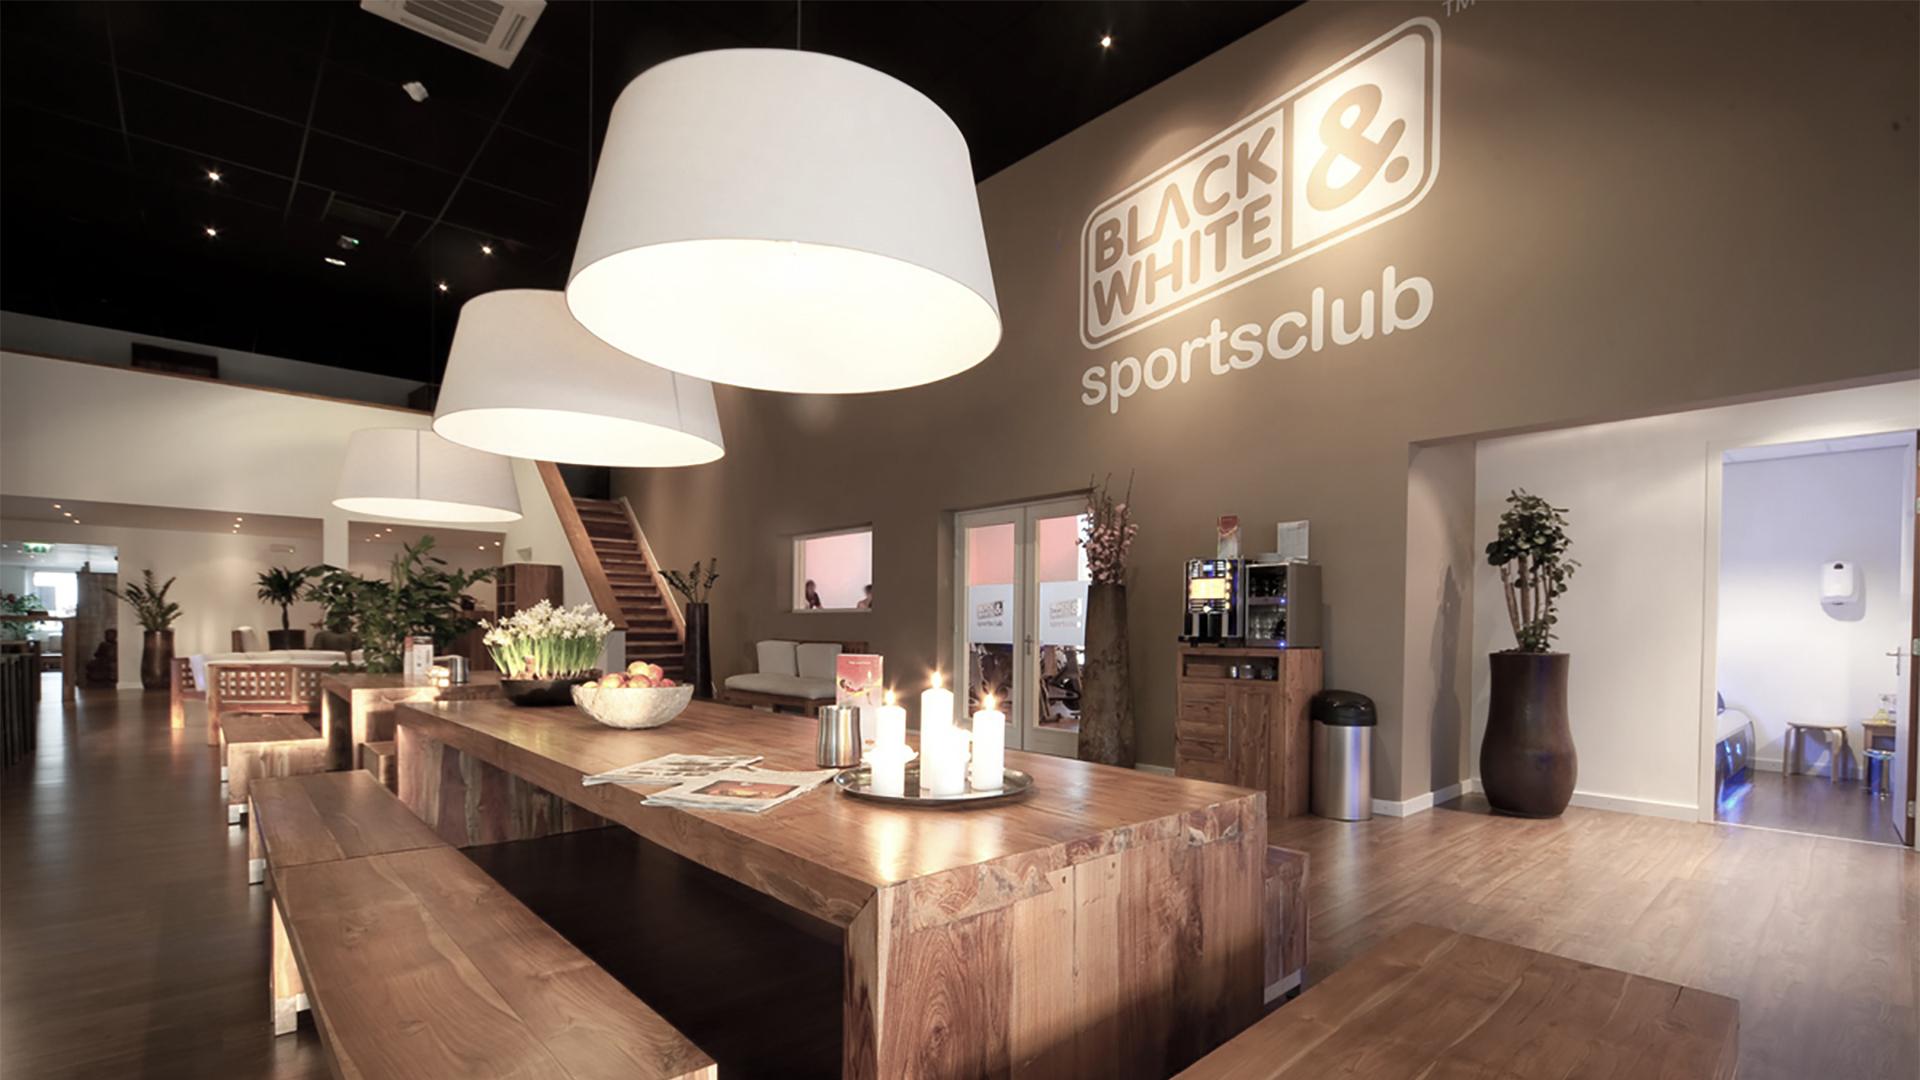 intieme sportsclub